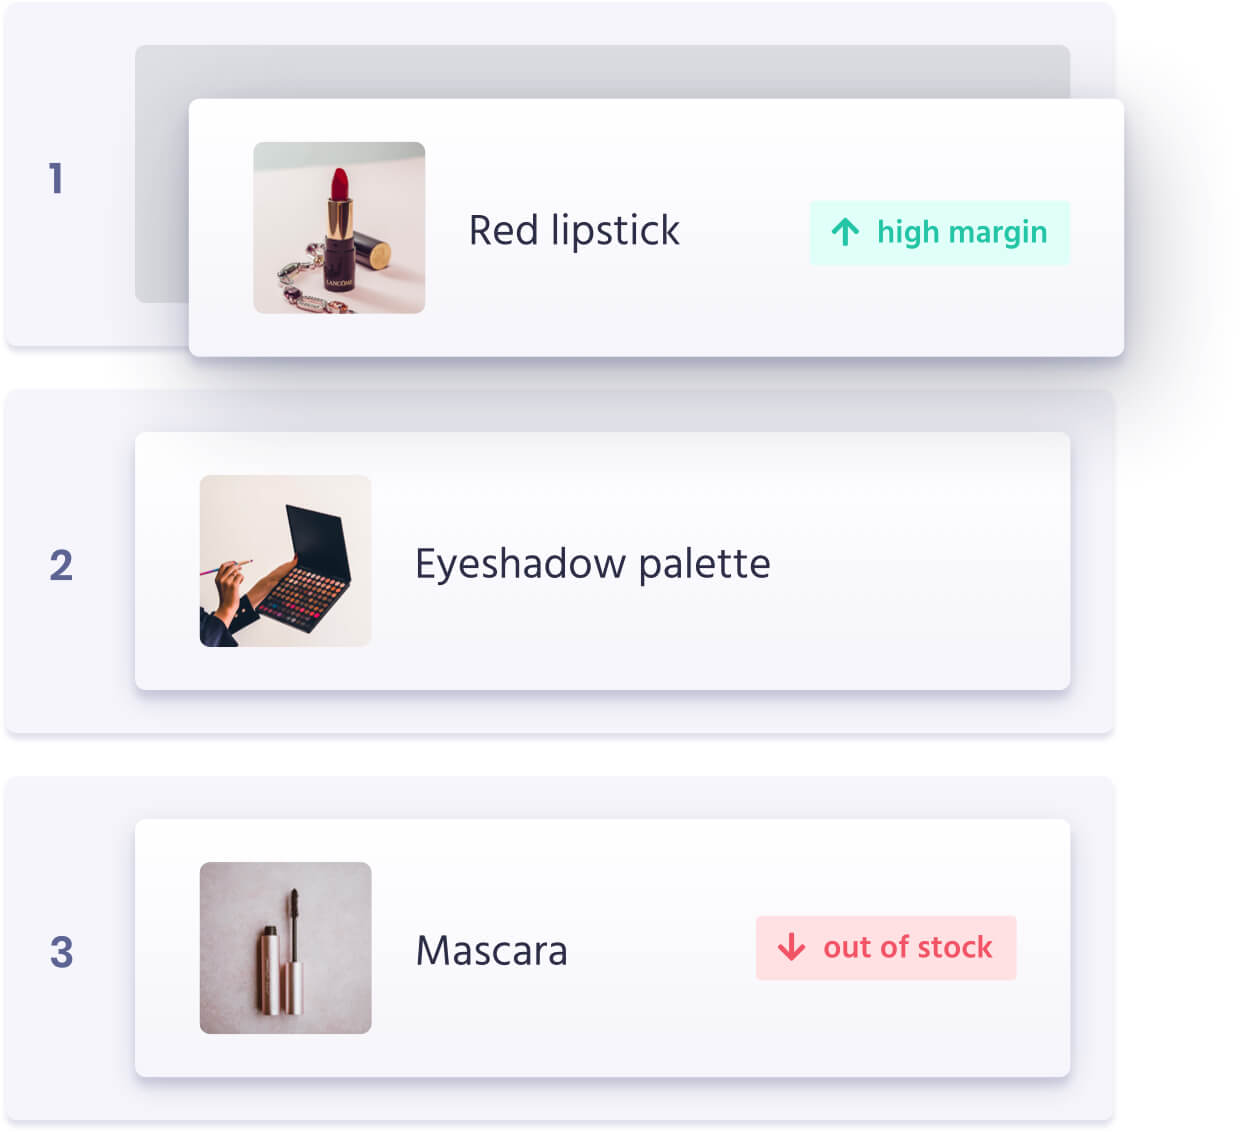 Custom Ranking